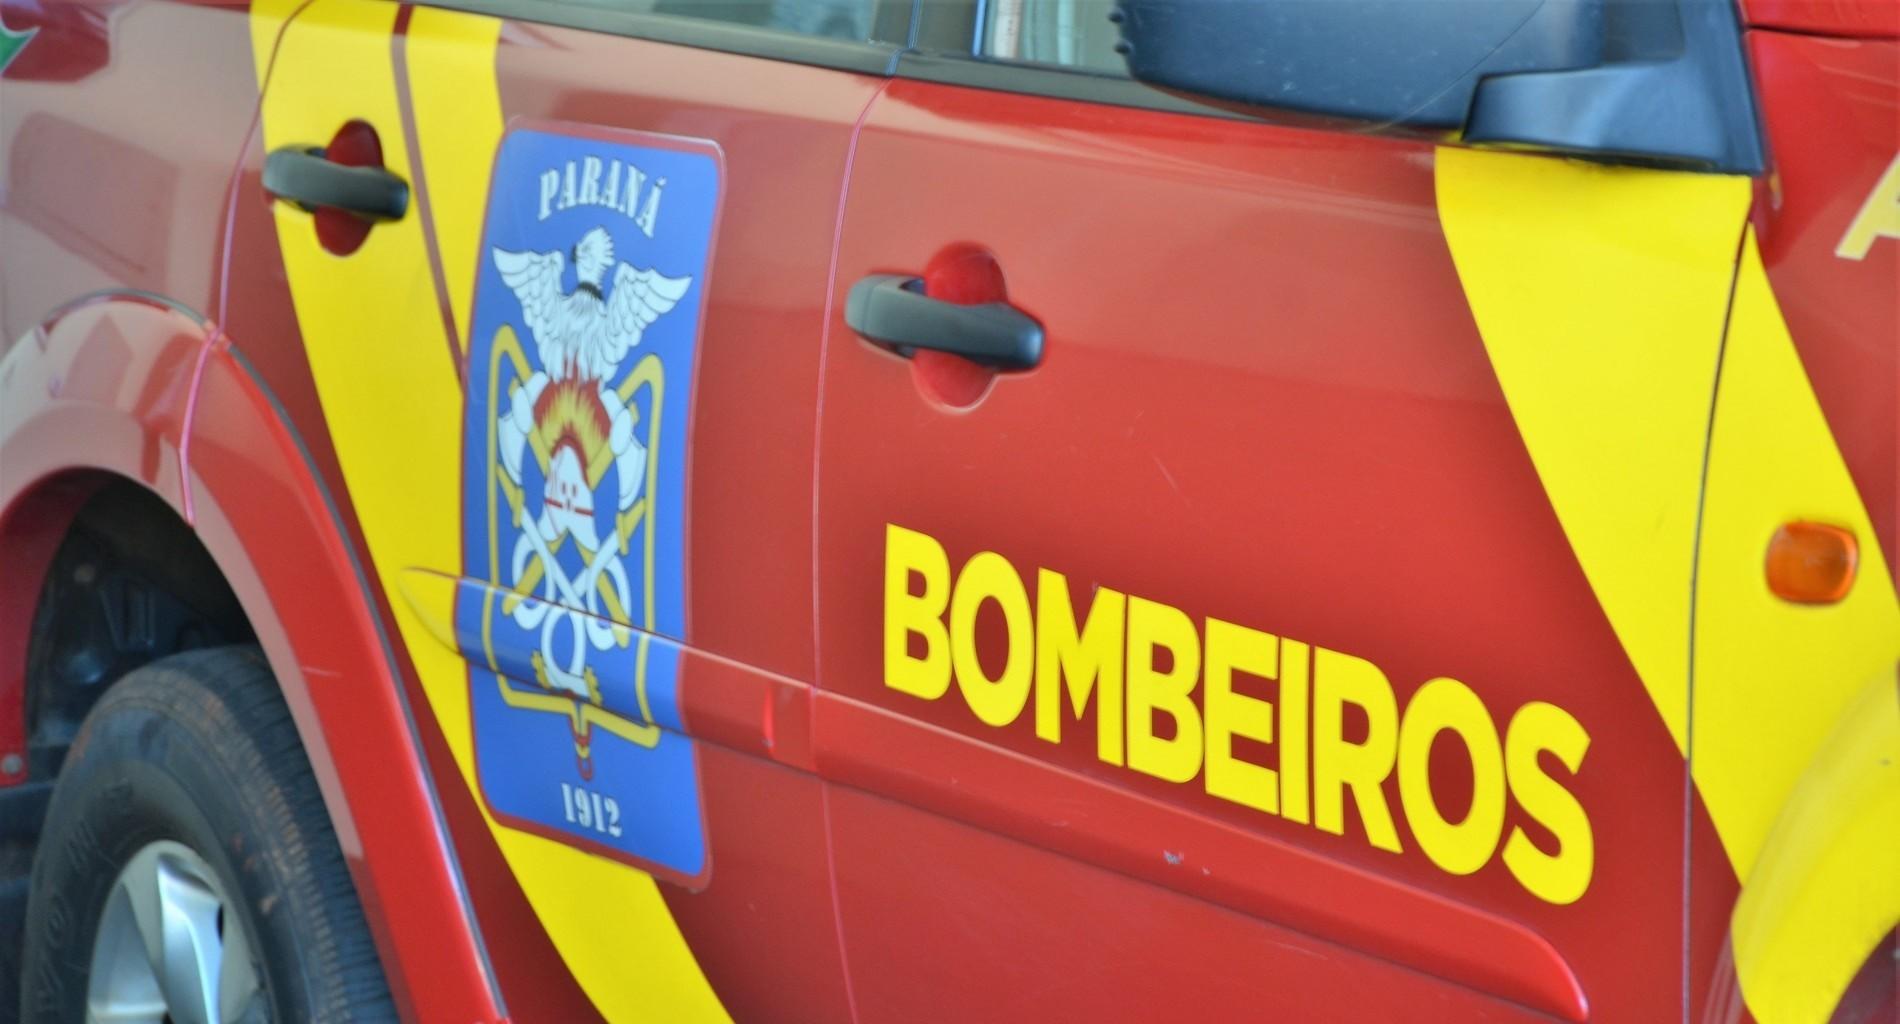 Bombeiros de Guaíra auxiliam nas buscas por adolescente no Rio Paraná